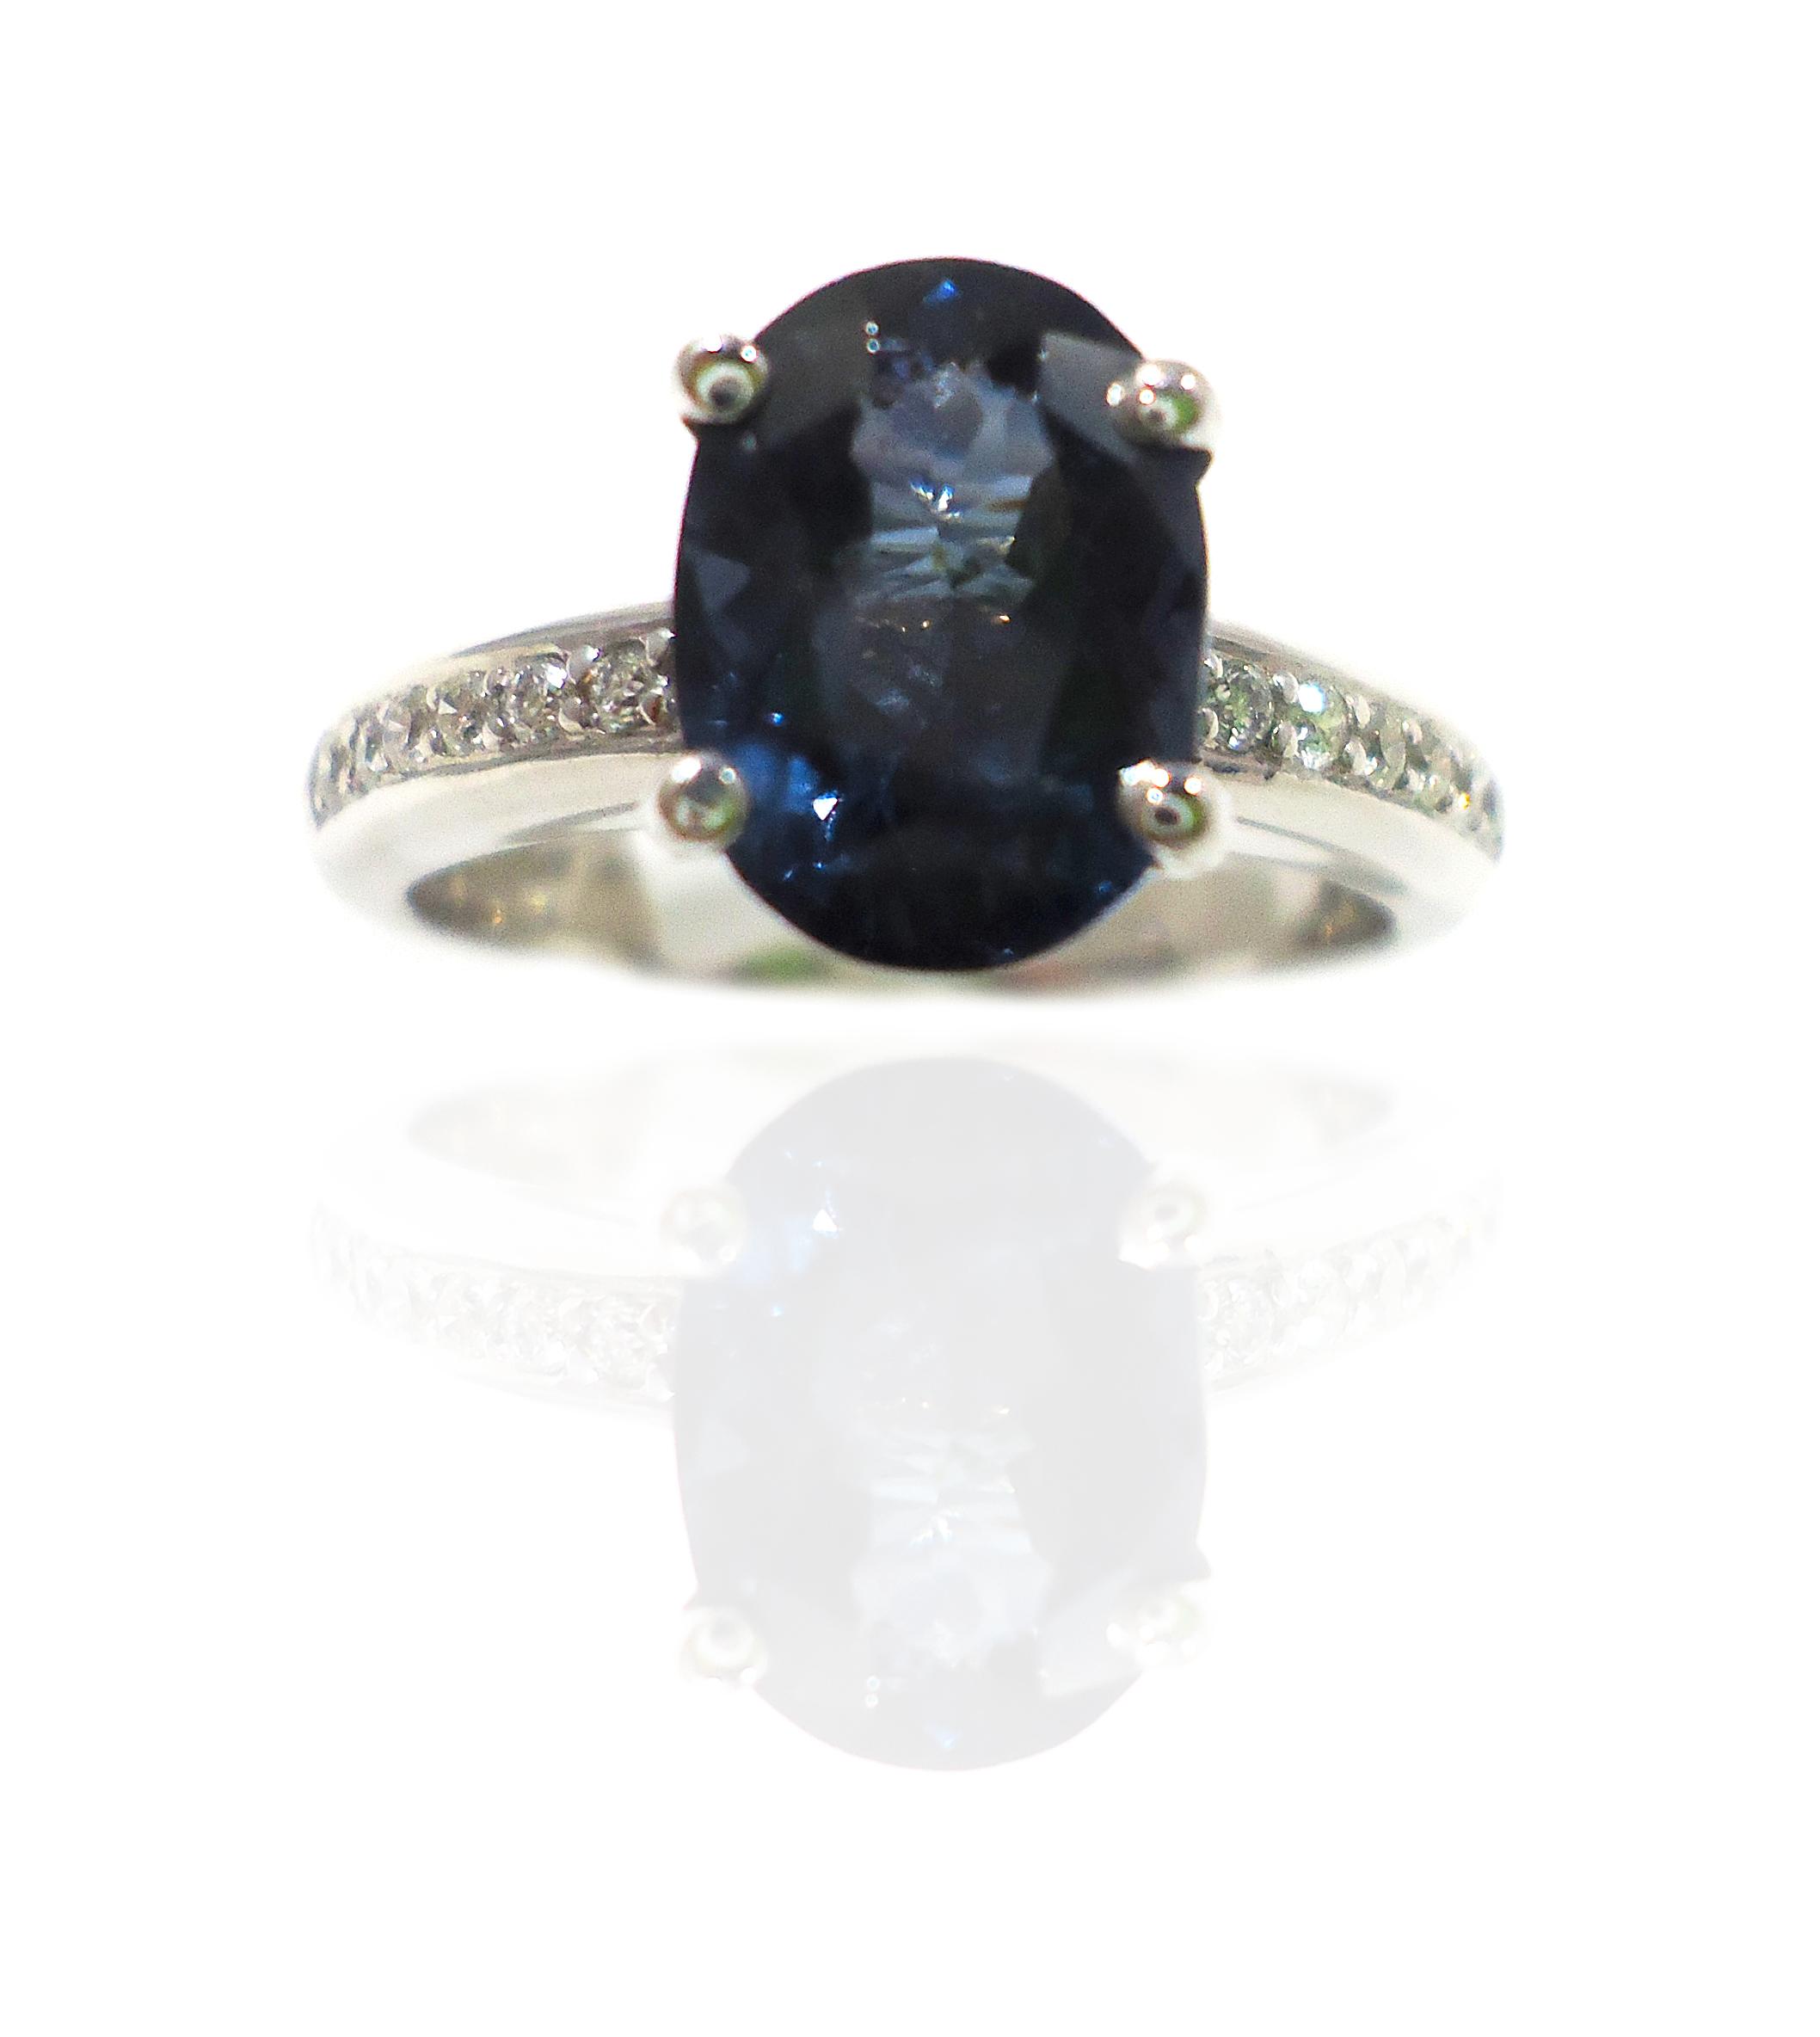 Spinel gem diamond ring!